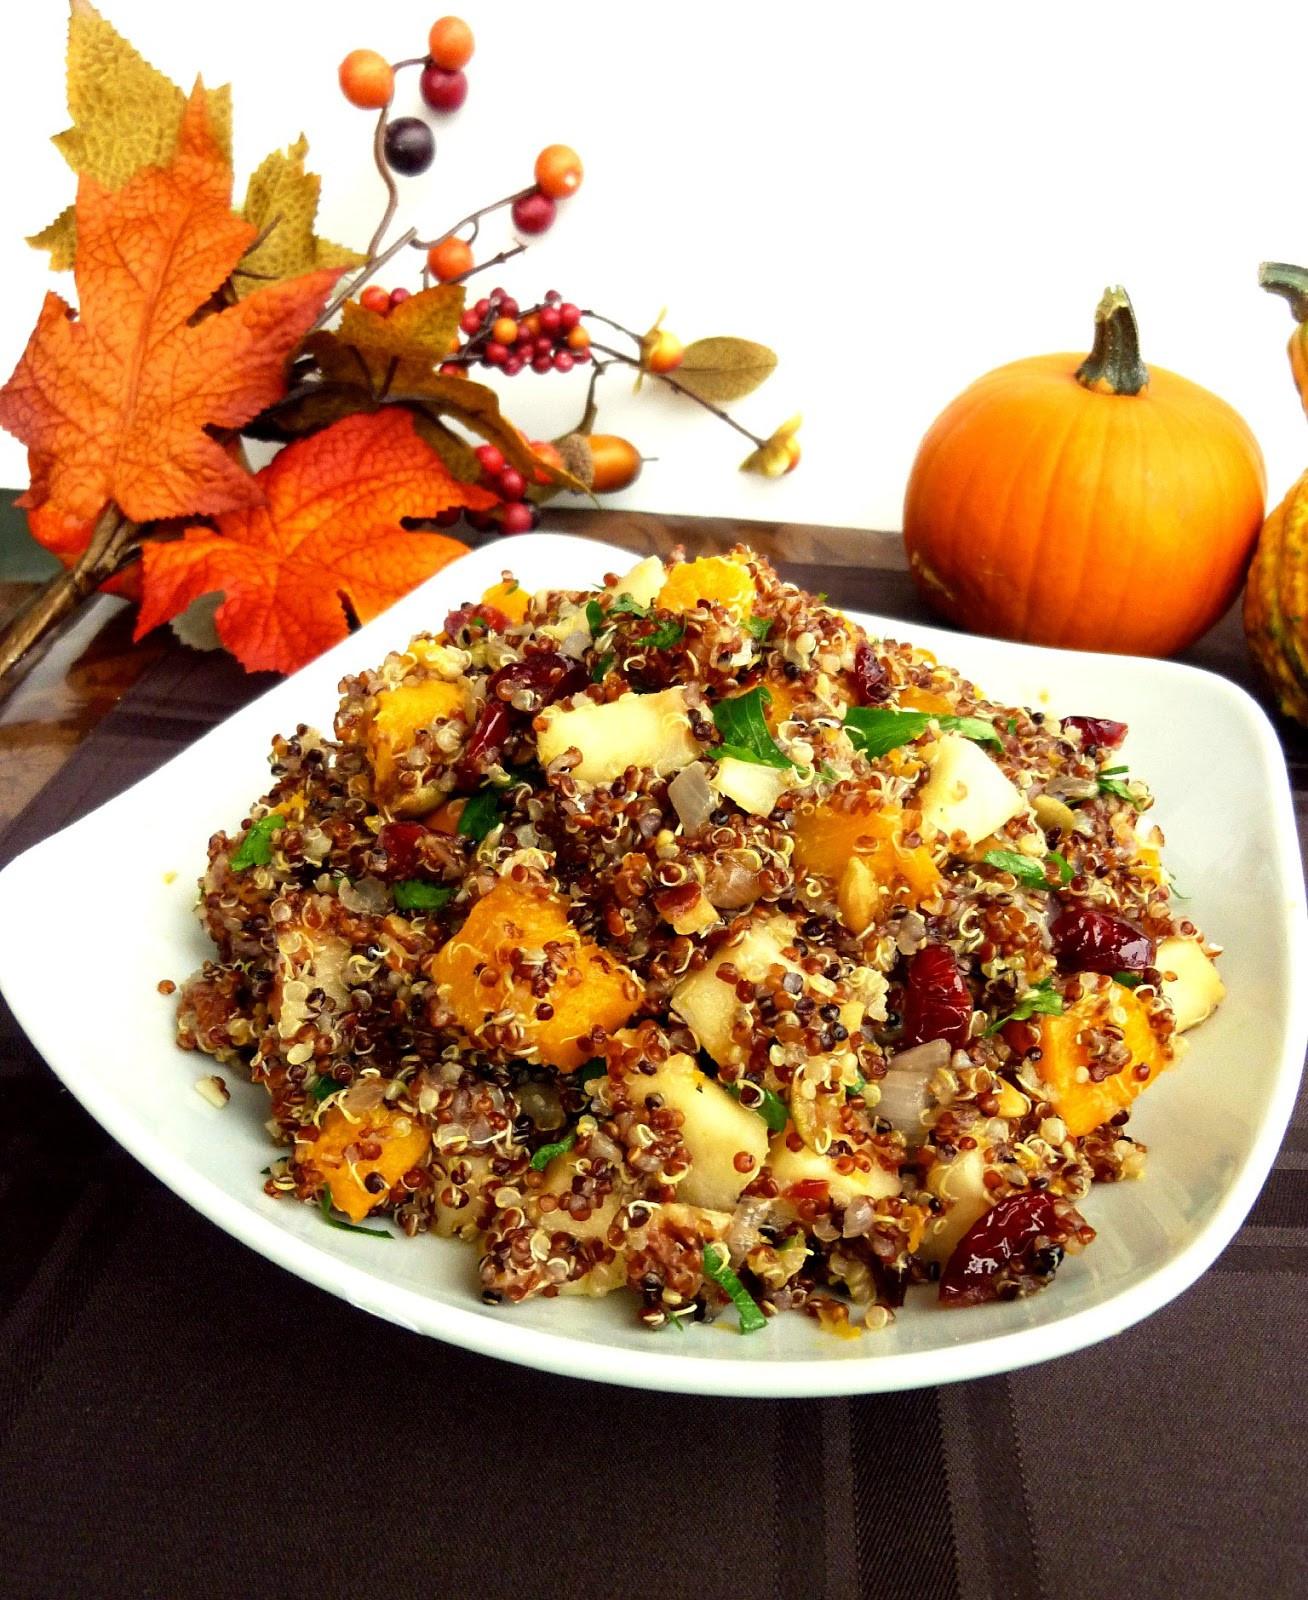 Thanksgiving Vegetarian Dish  Vanilla & Spice Recipes for a Ve arian Thanksgiving